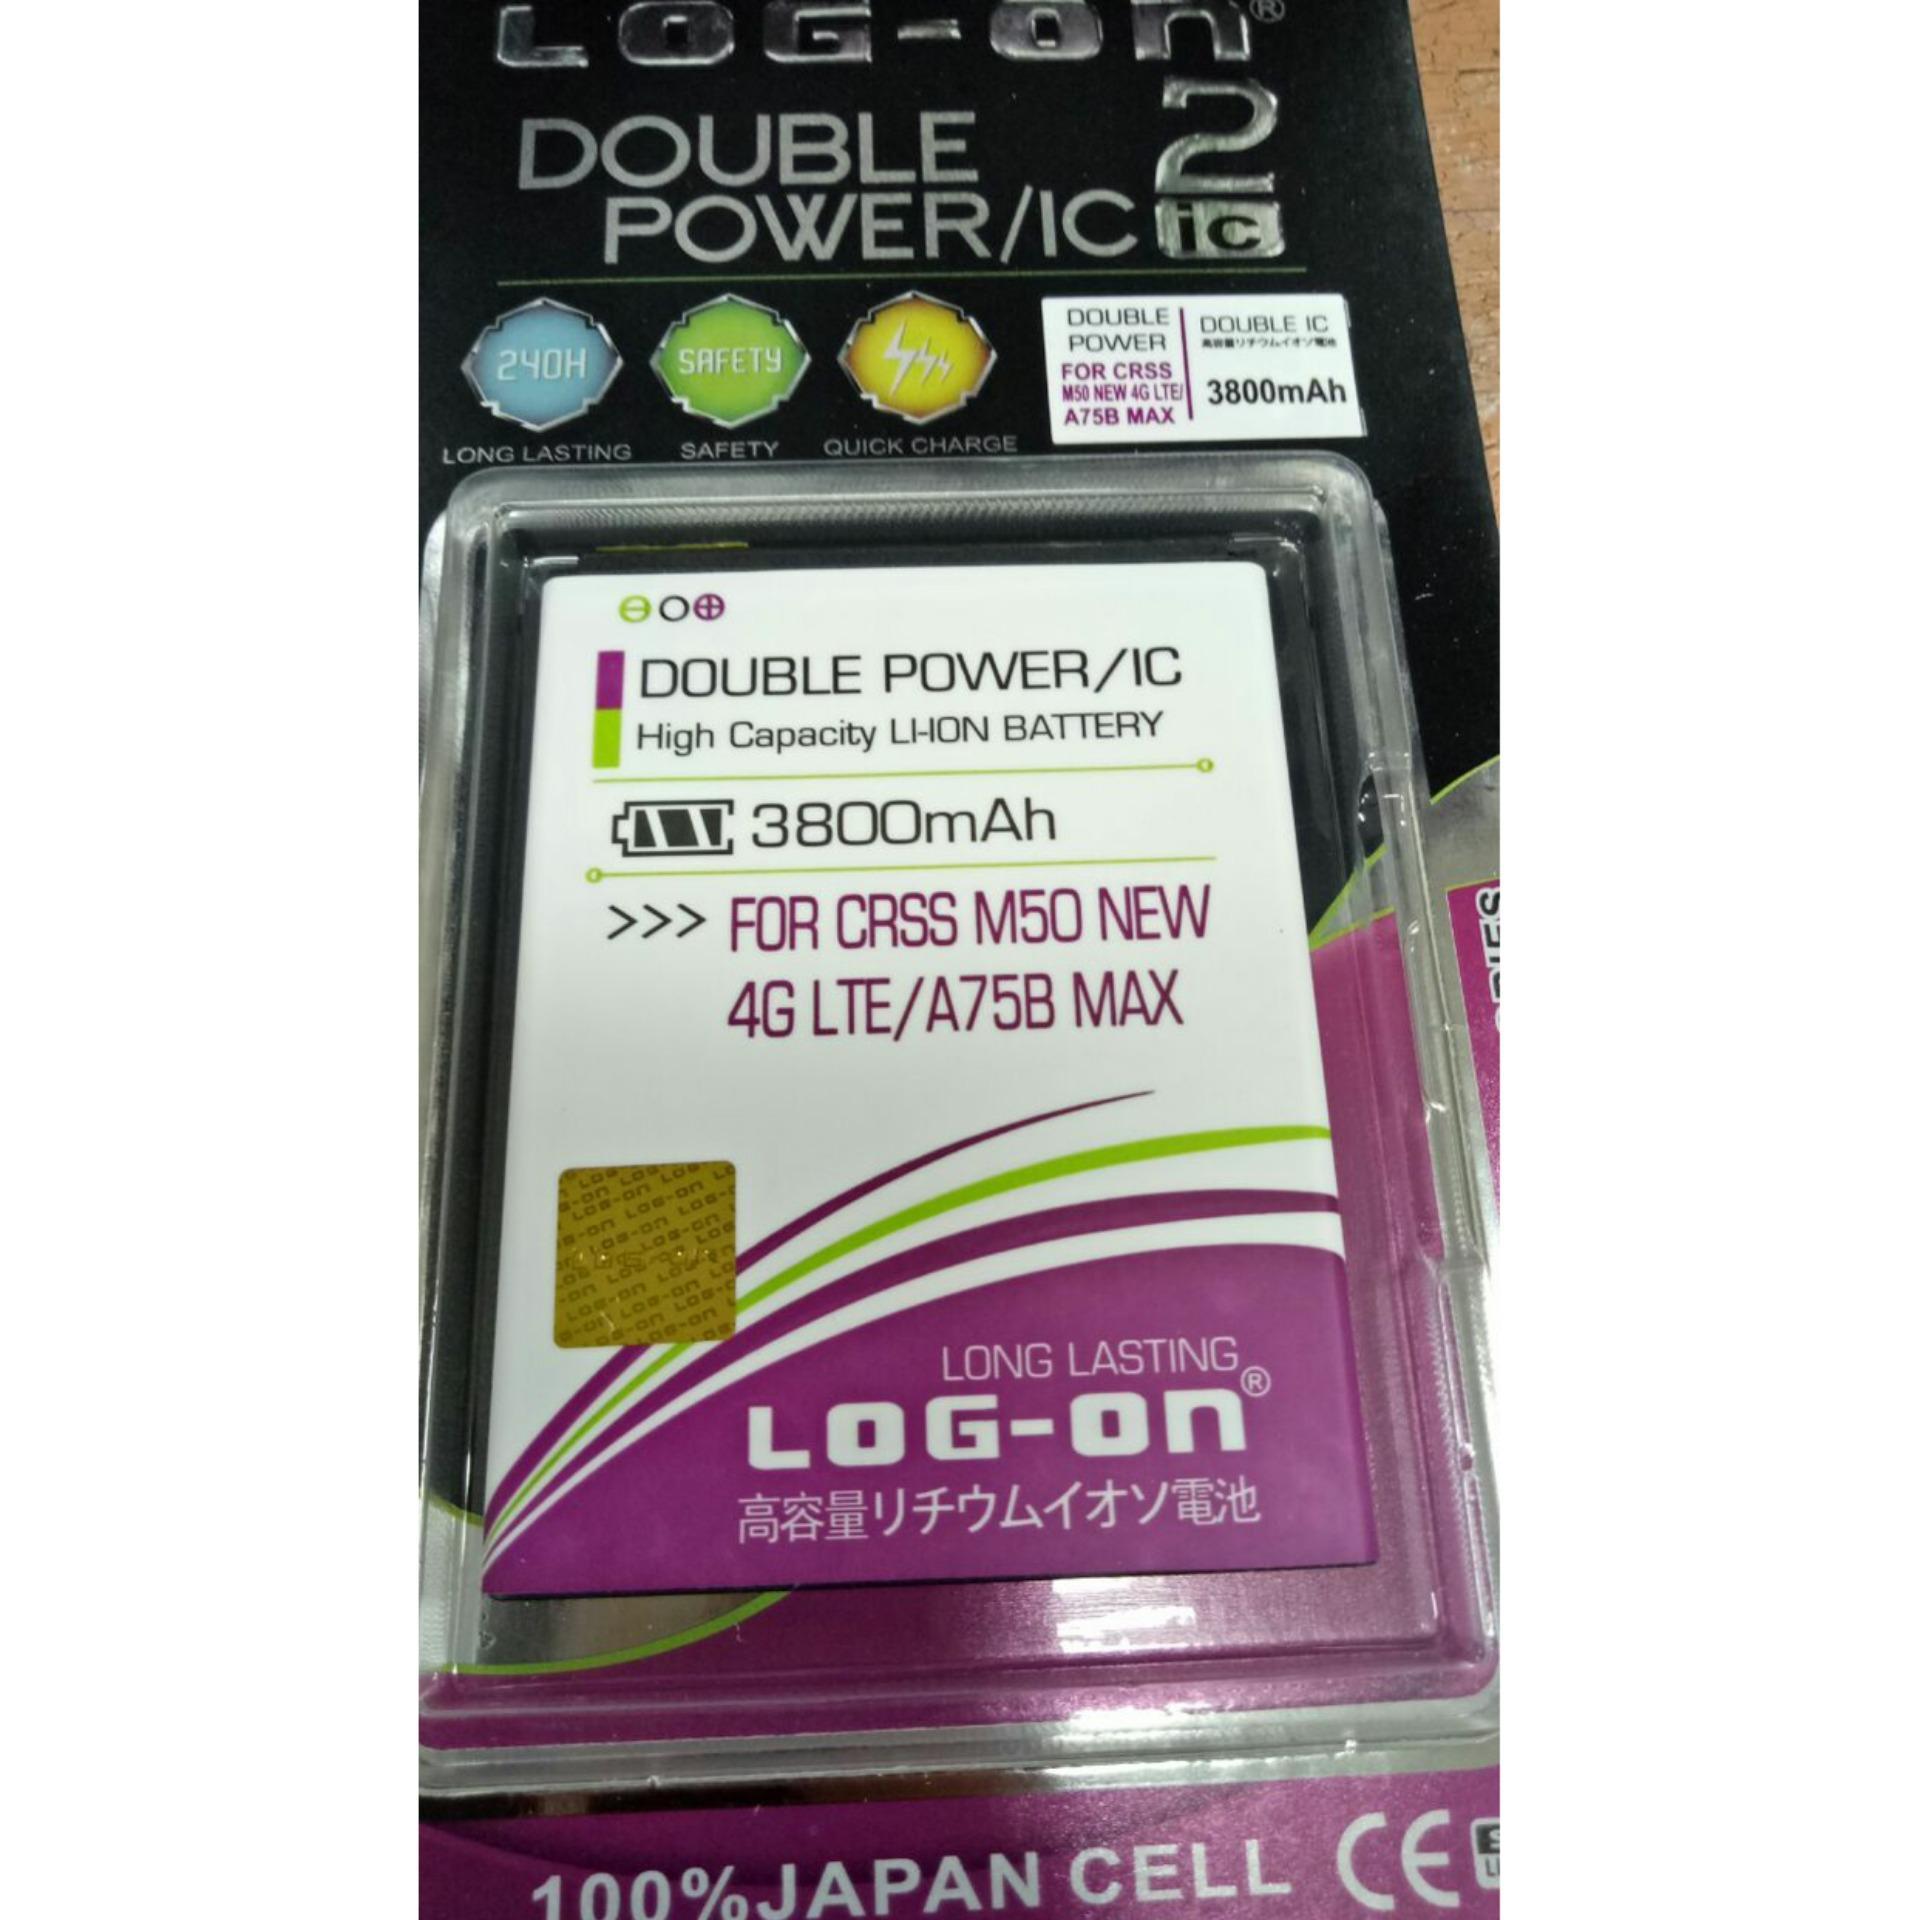 Batre Baterai Double Power LOG-ON Evercoss M50 New 4G A75B Max